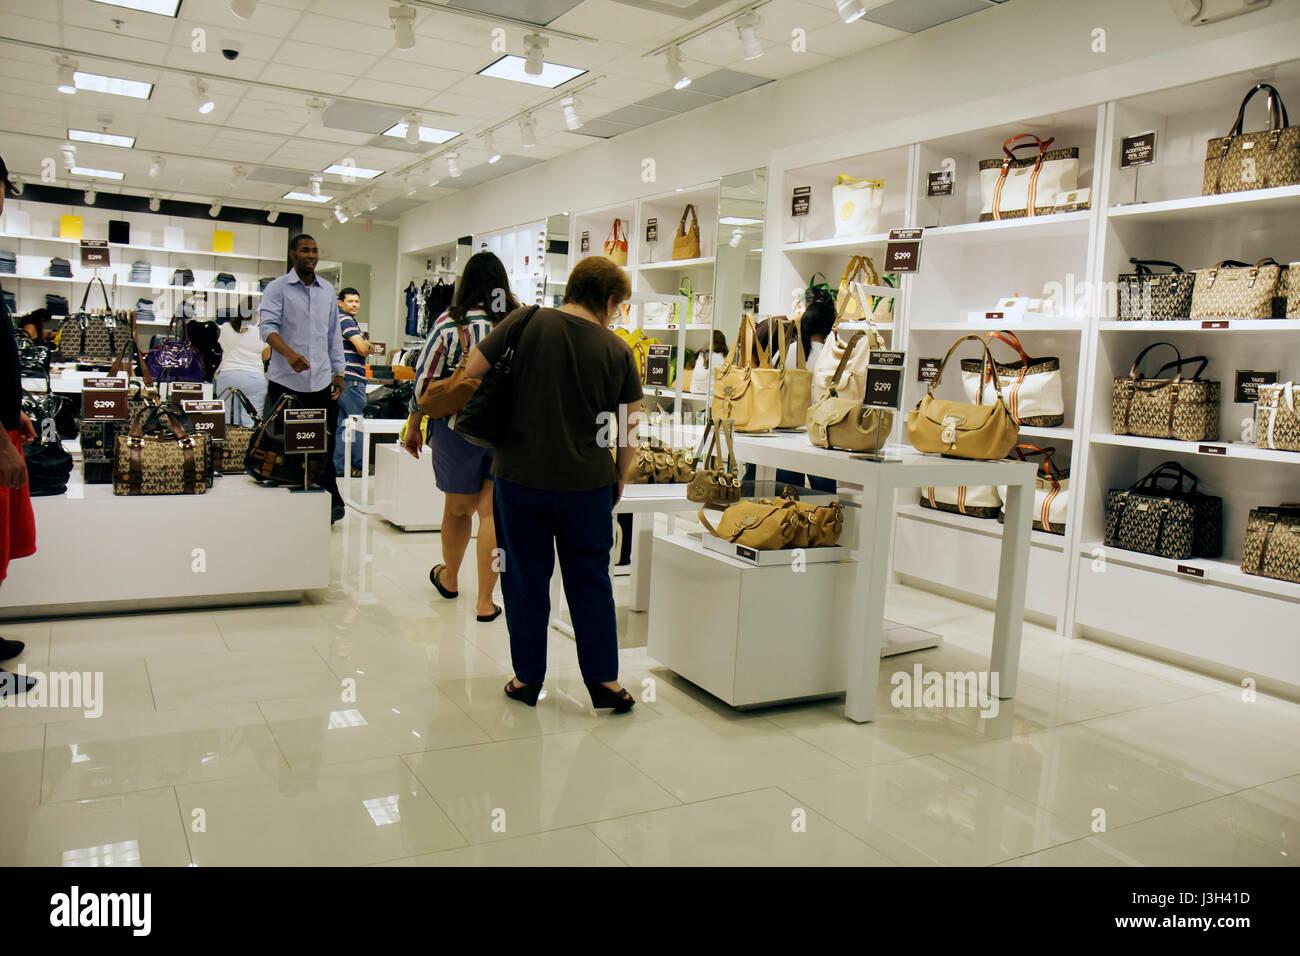 446d47548e0f Miami Florida Dolphin Mall Michael Kors outlet store Black man woman women  shoppers shopping clerk sale designer handbags leathe